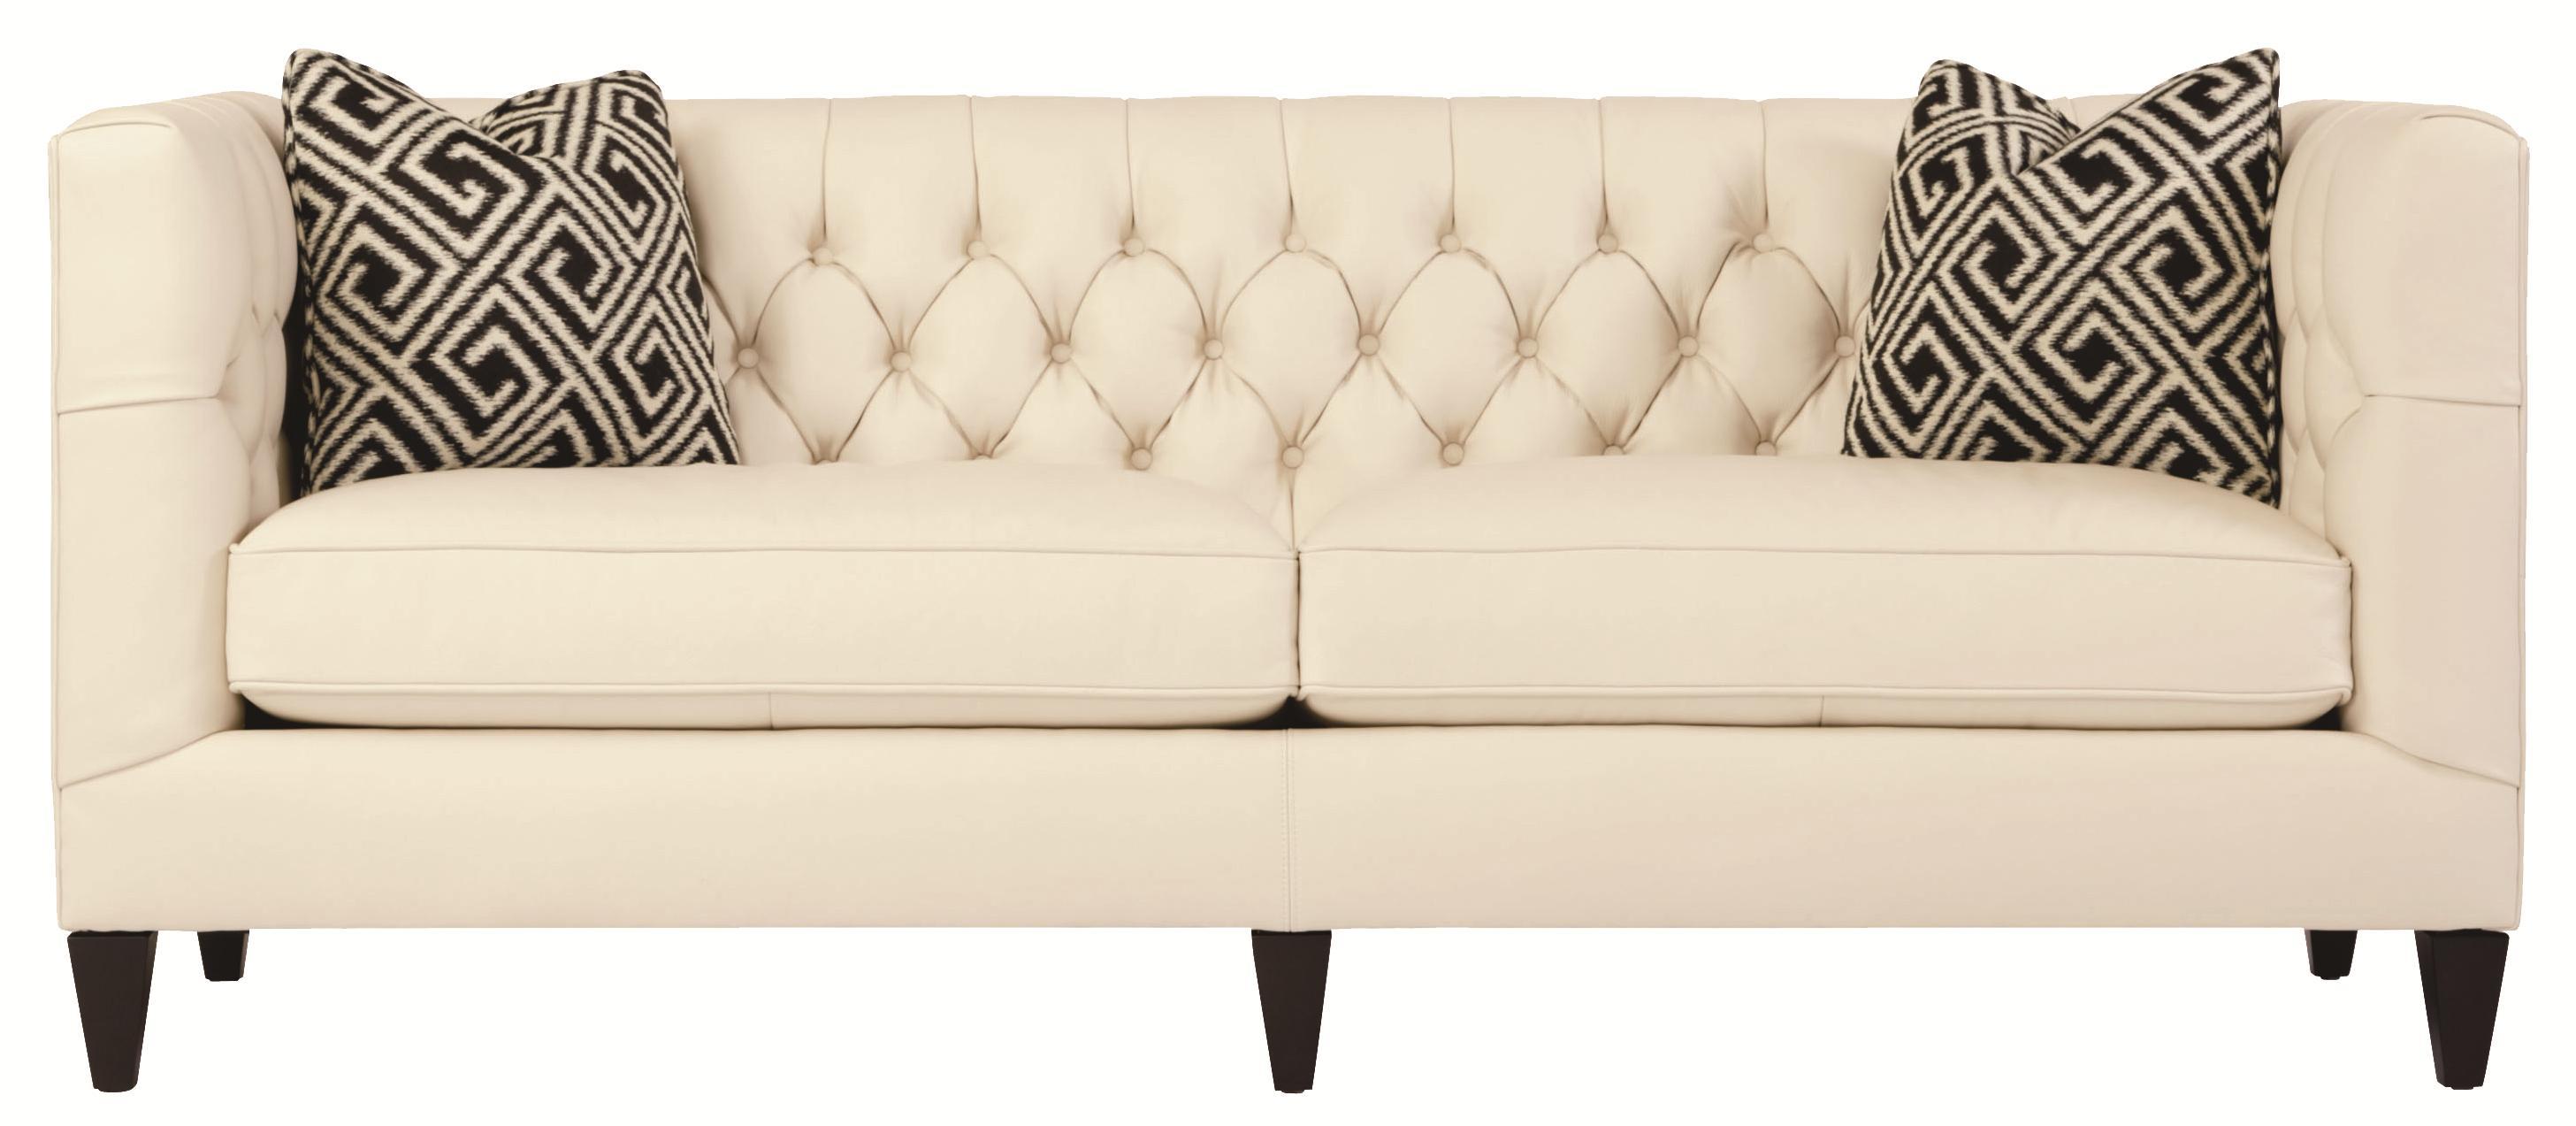 Bernhardt Interiors   Sofas Transitional Styled Beckett Leather Sofa In Tuxedo  Sofa Style